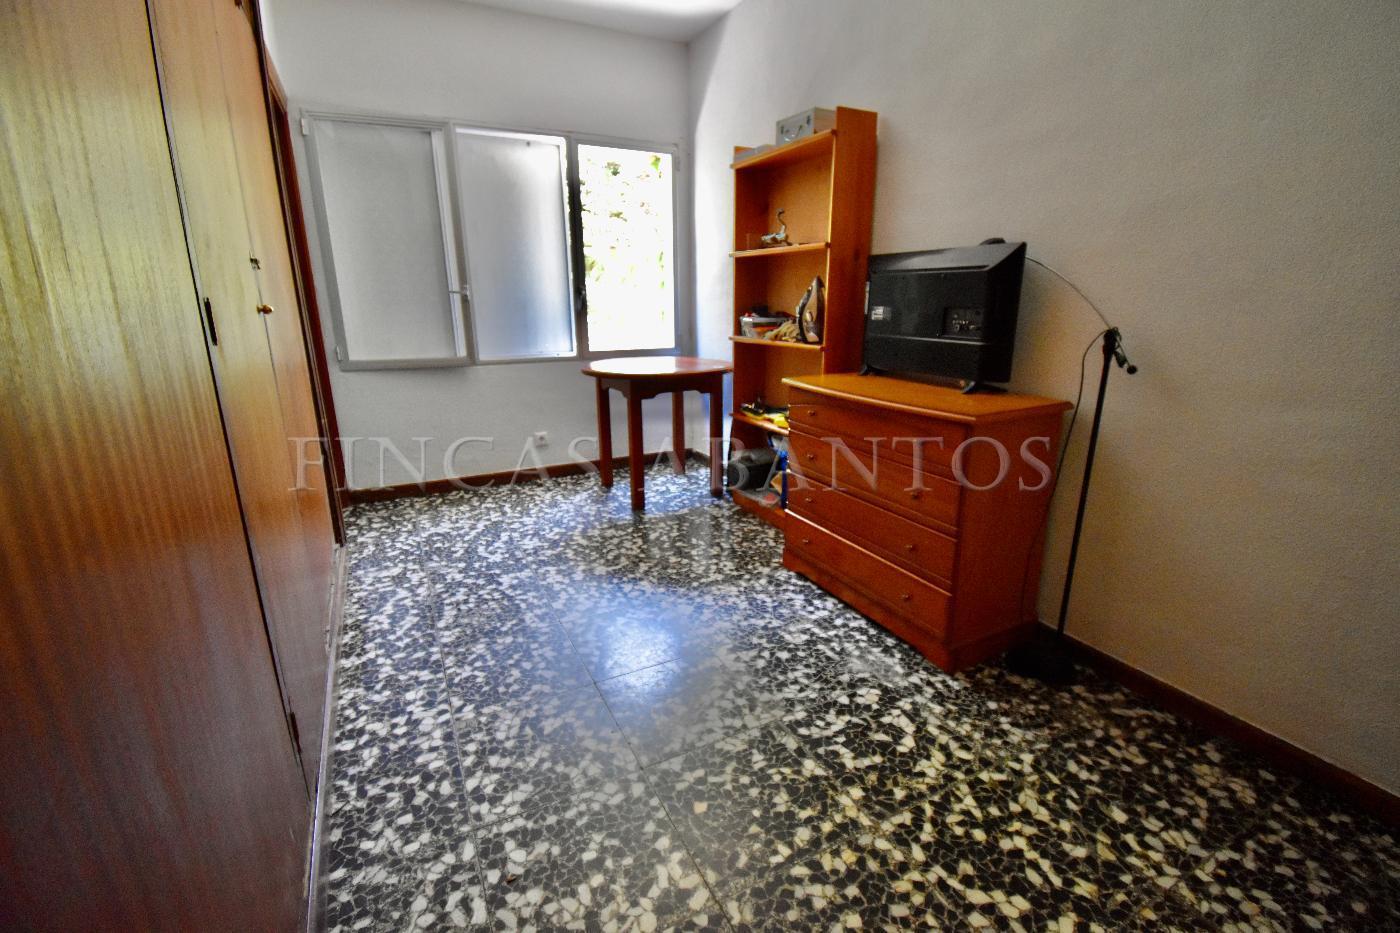 For sale of chalet in San Lorenzo de El Escorial